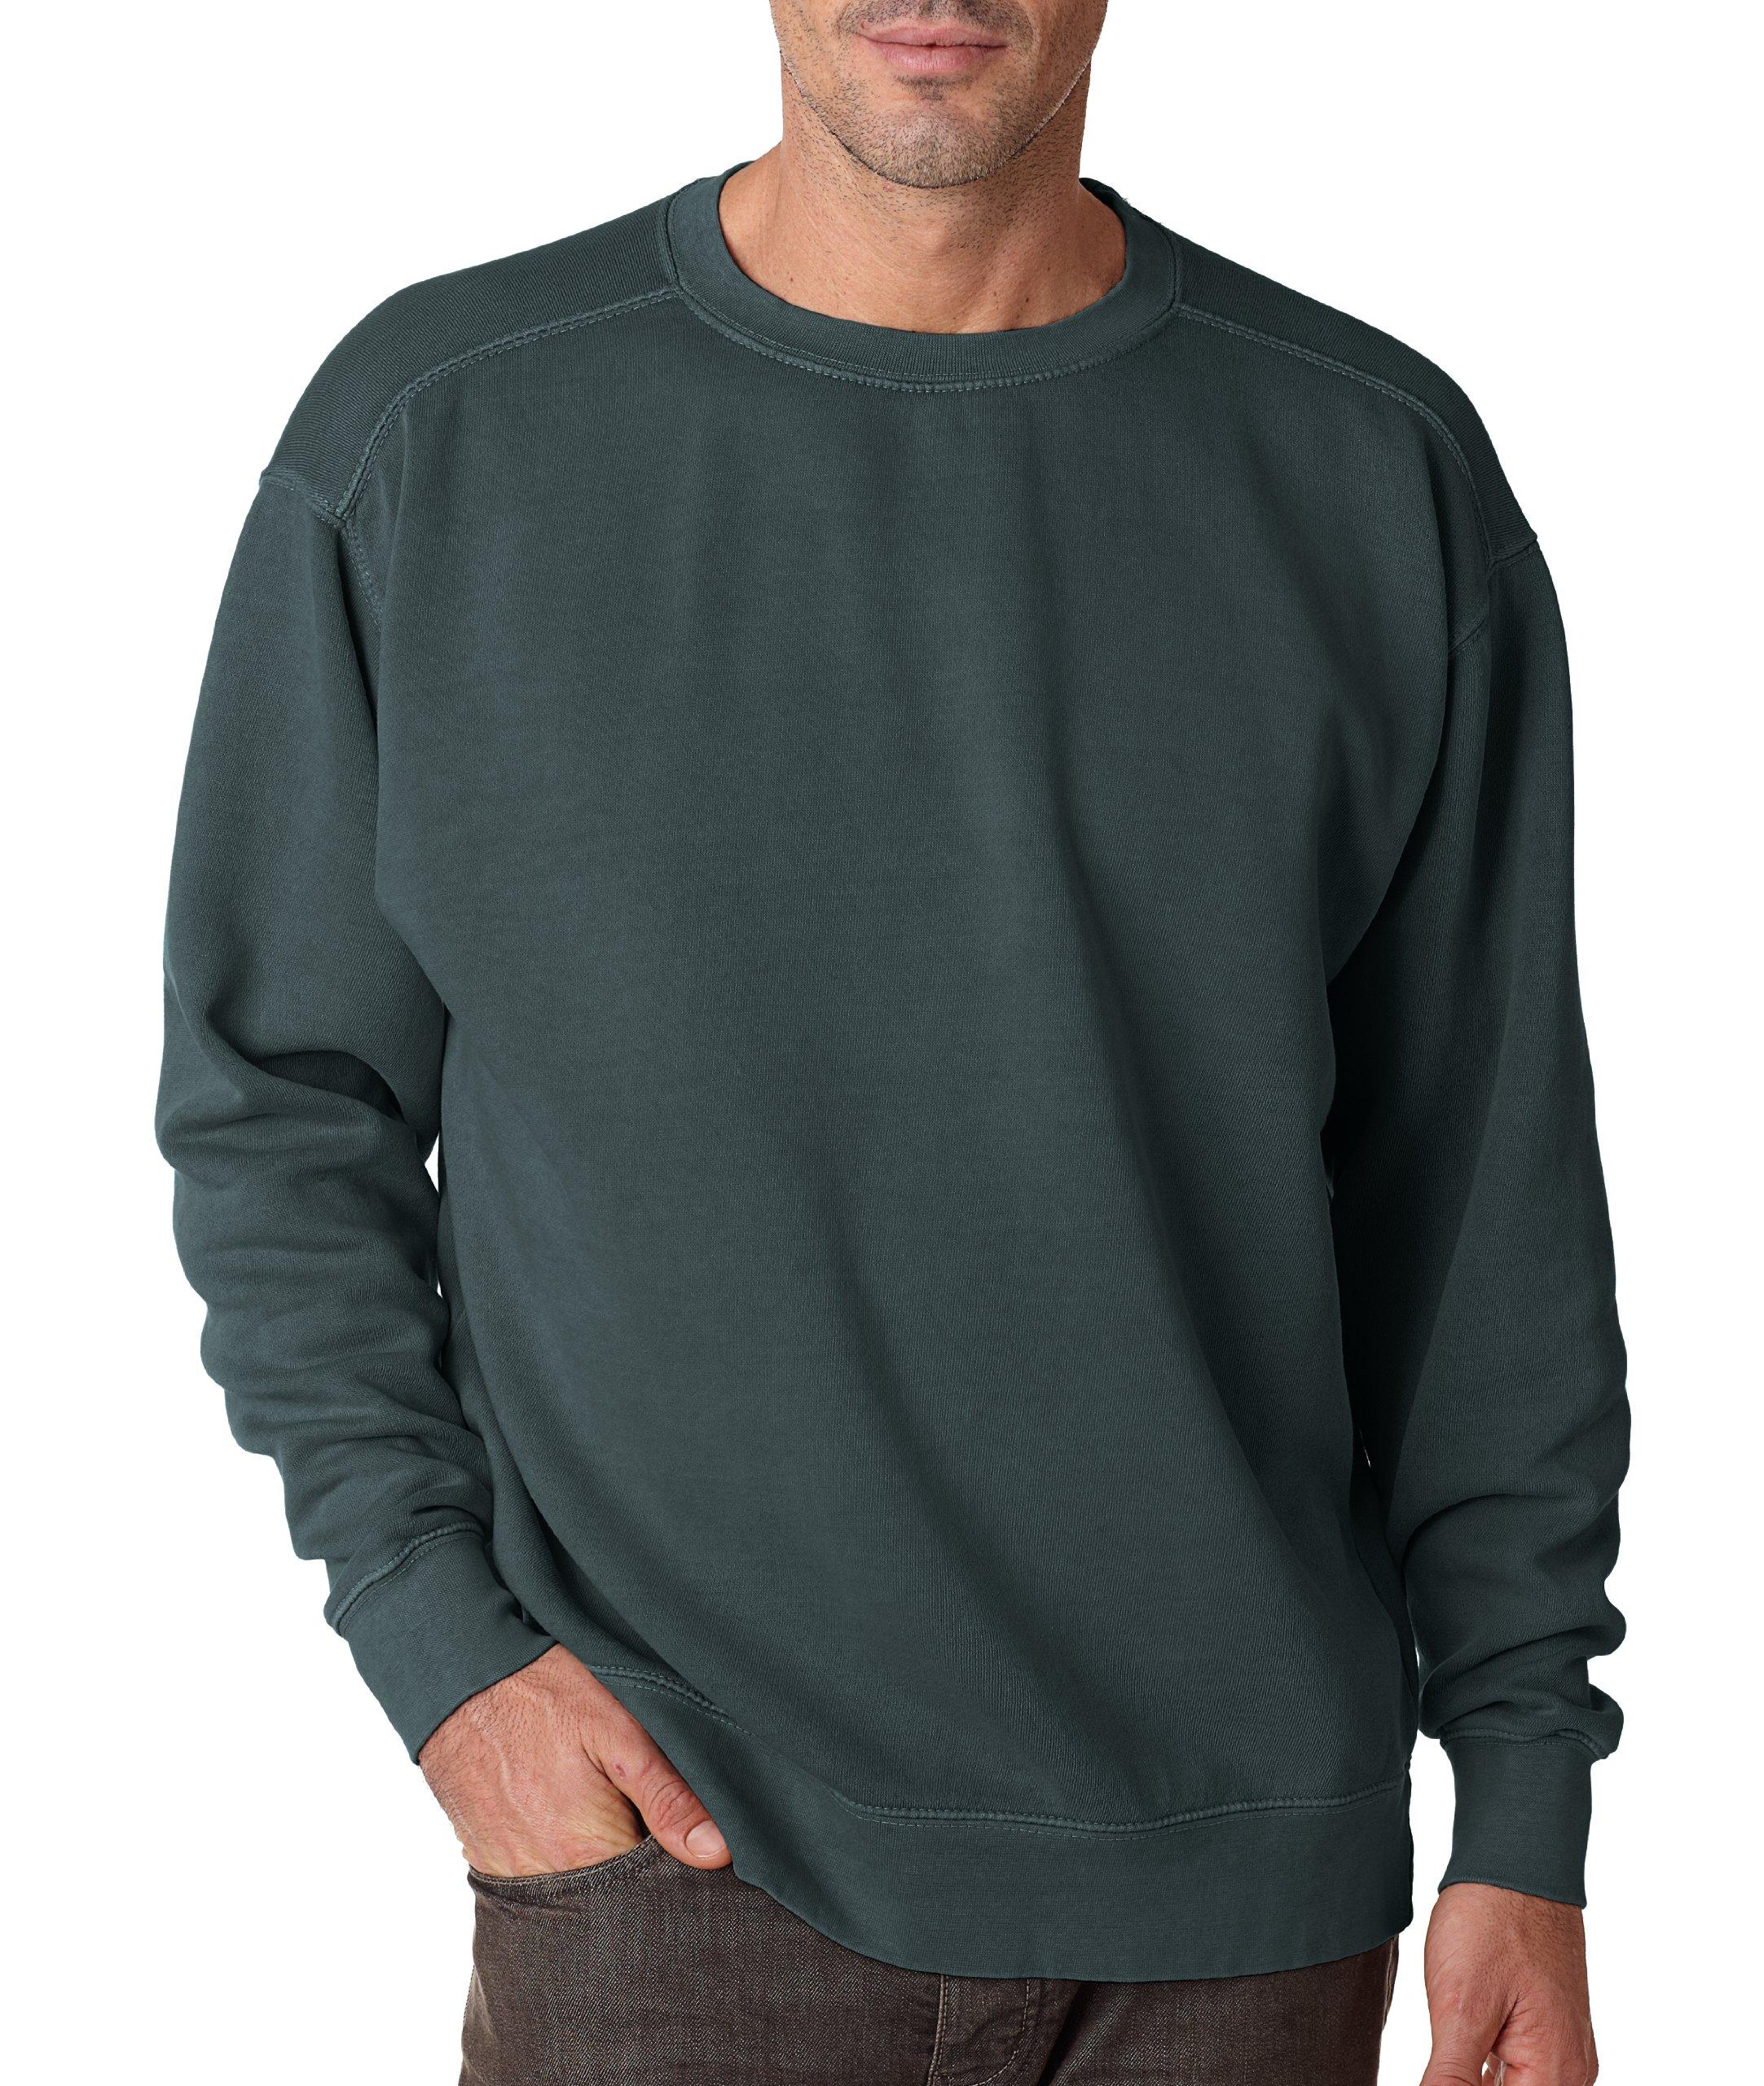 Adult Crew-Neck Blended Sweatshirt (Blue Spruce PgmDye) (Medium)